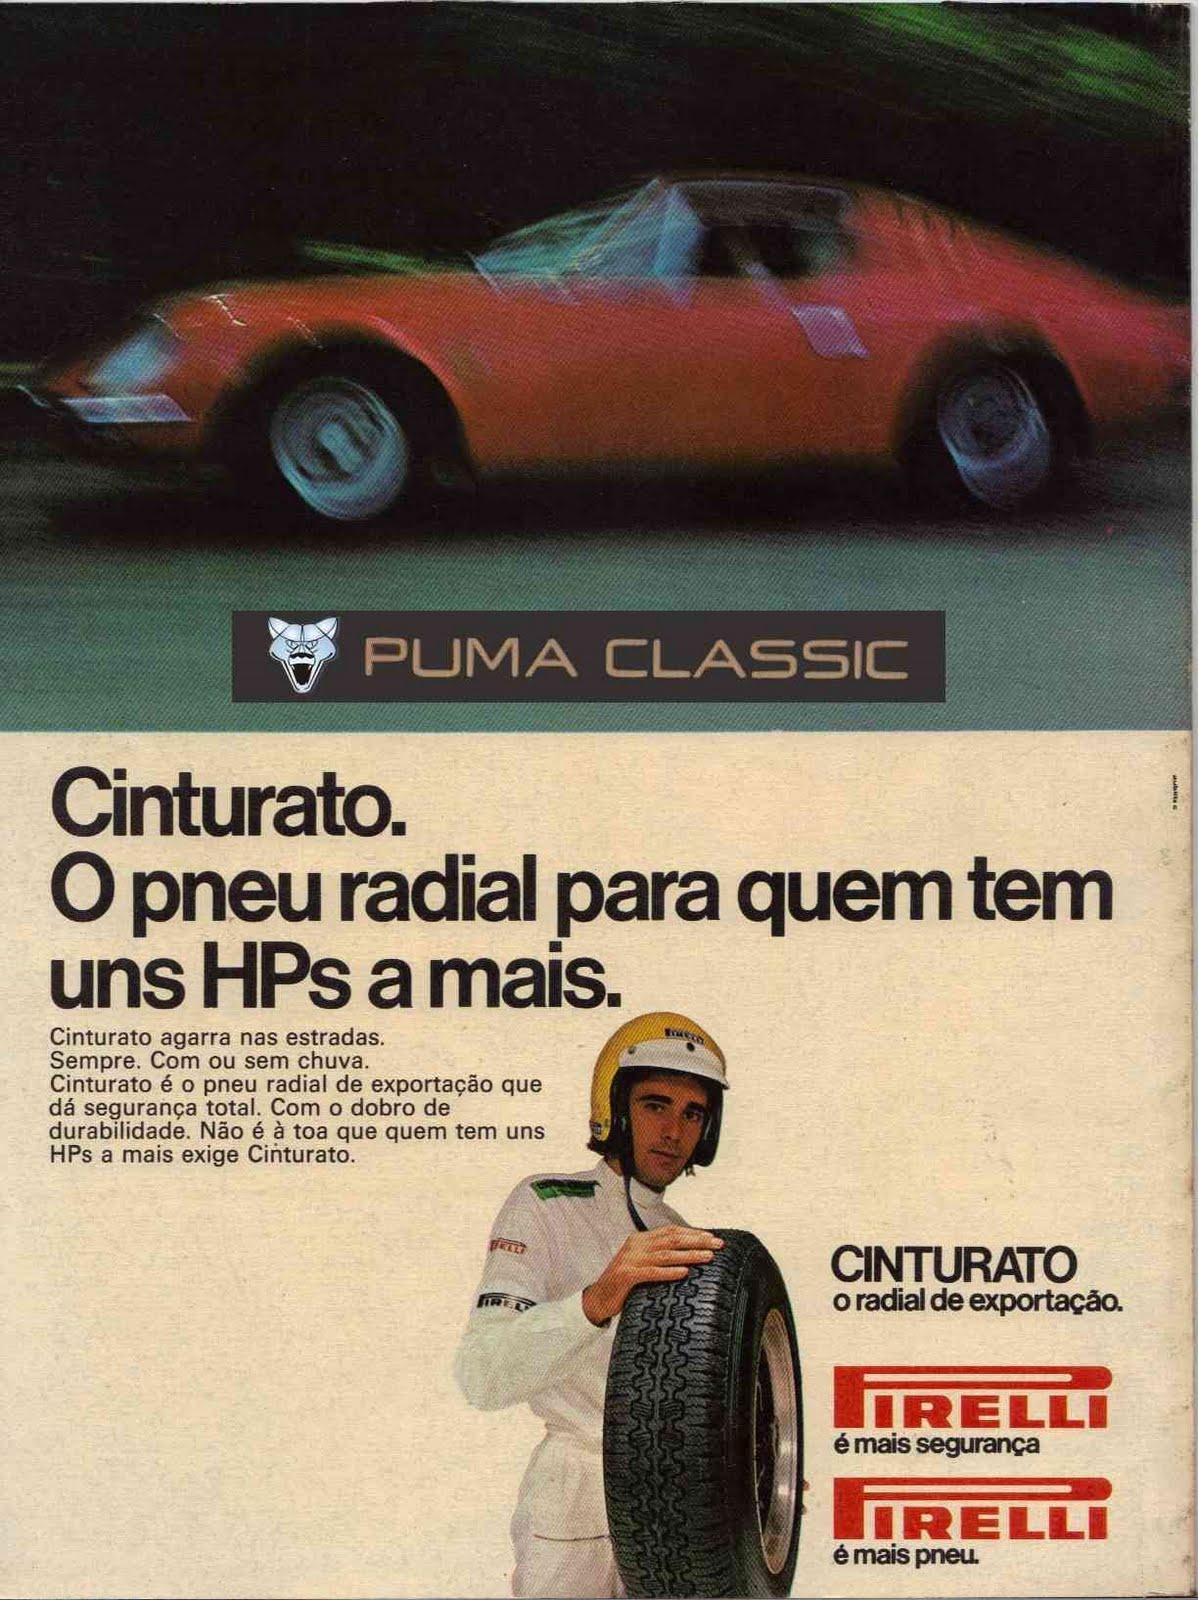 http://1.bp.blogspot.com/_oKPRrlJAWBw/S61eV6SGf9I/AAAAAAAANSQ/mGLHiMwNto0/s1600/Copy+of+Propaganda_Pirelli_cinturato_maio_1972.jpg